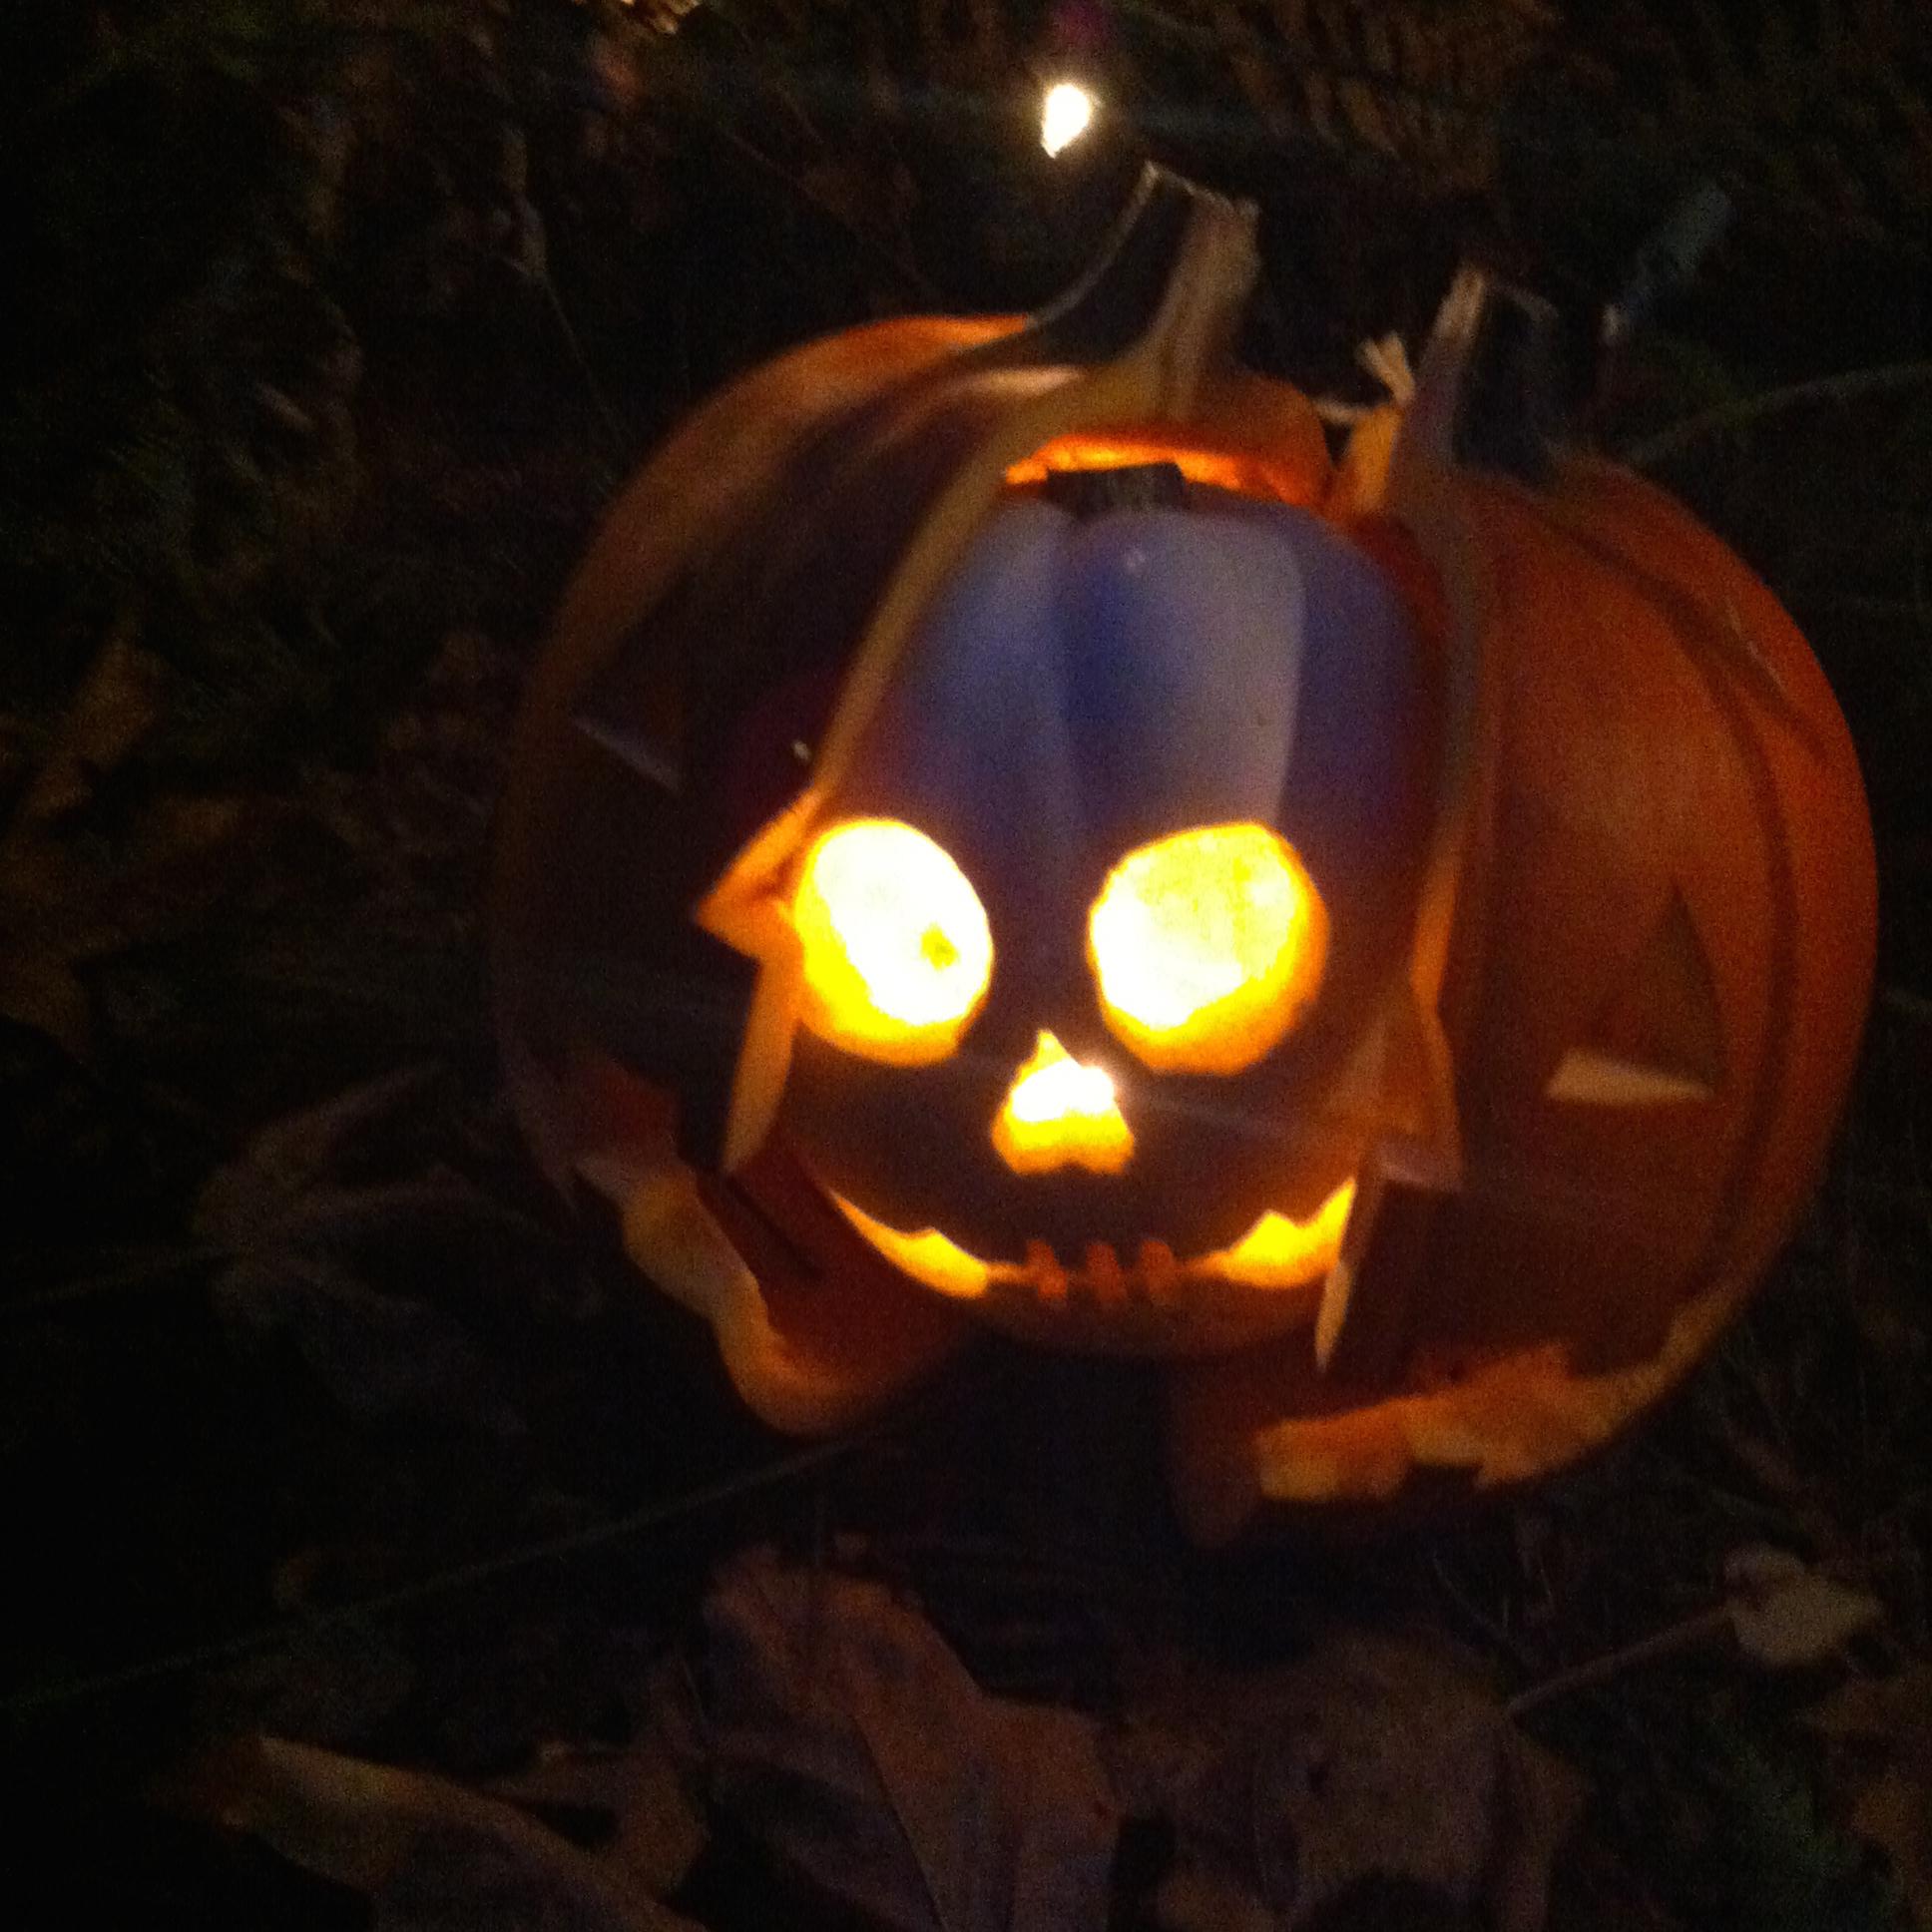 carved pumpkin with skull inside at bainbridge gardens annual pumpkin walk, BAINBRIDGE ISLAND